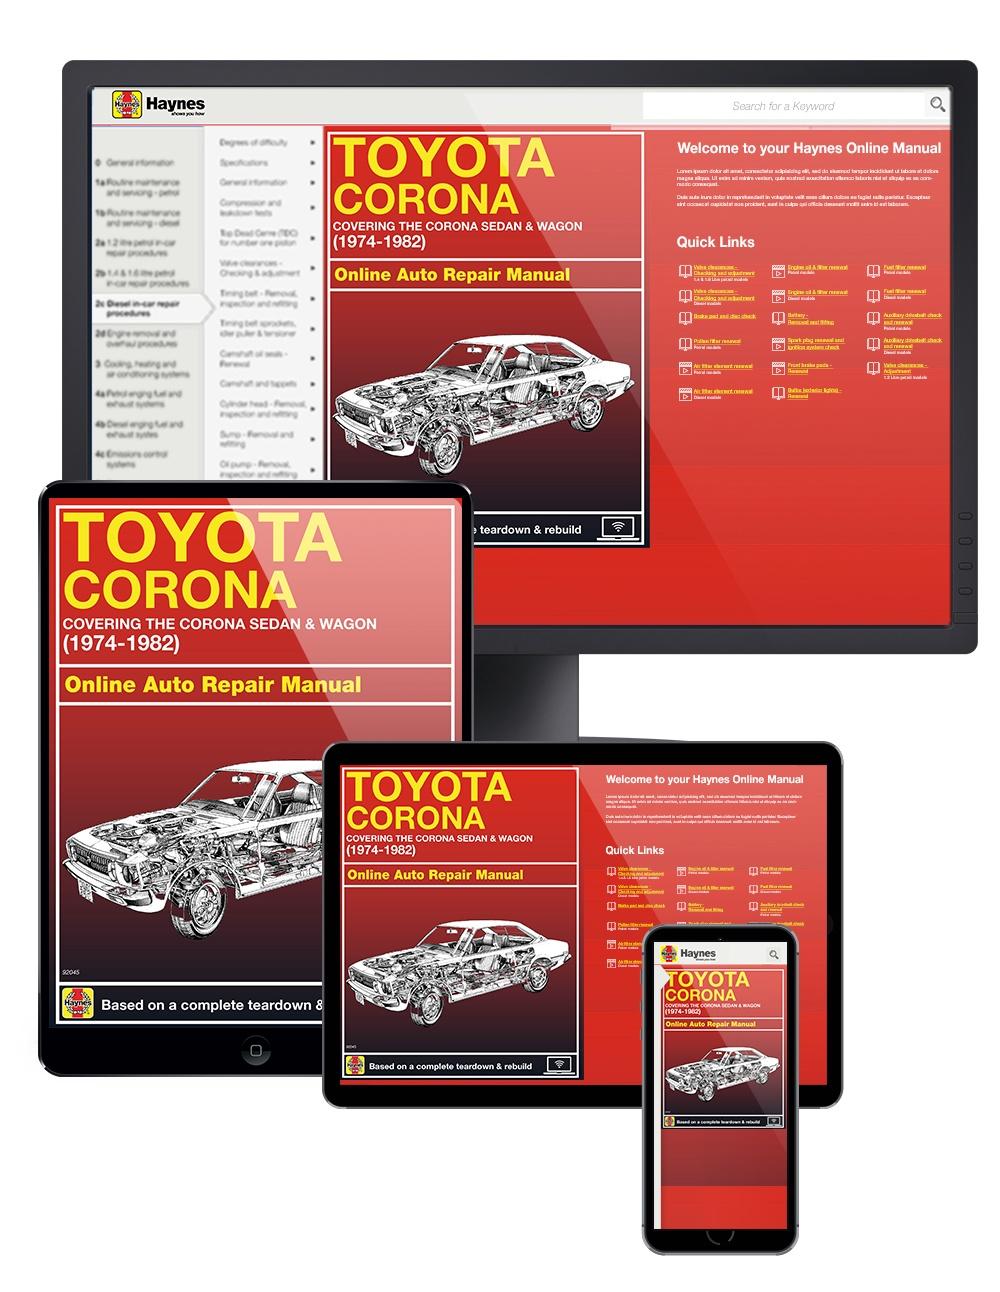 Toyota Corona Sedan & Wagon (74-82) Haynes Online Manual